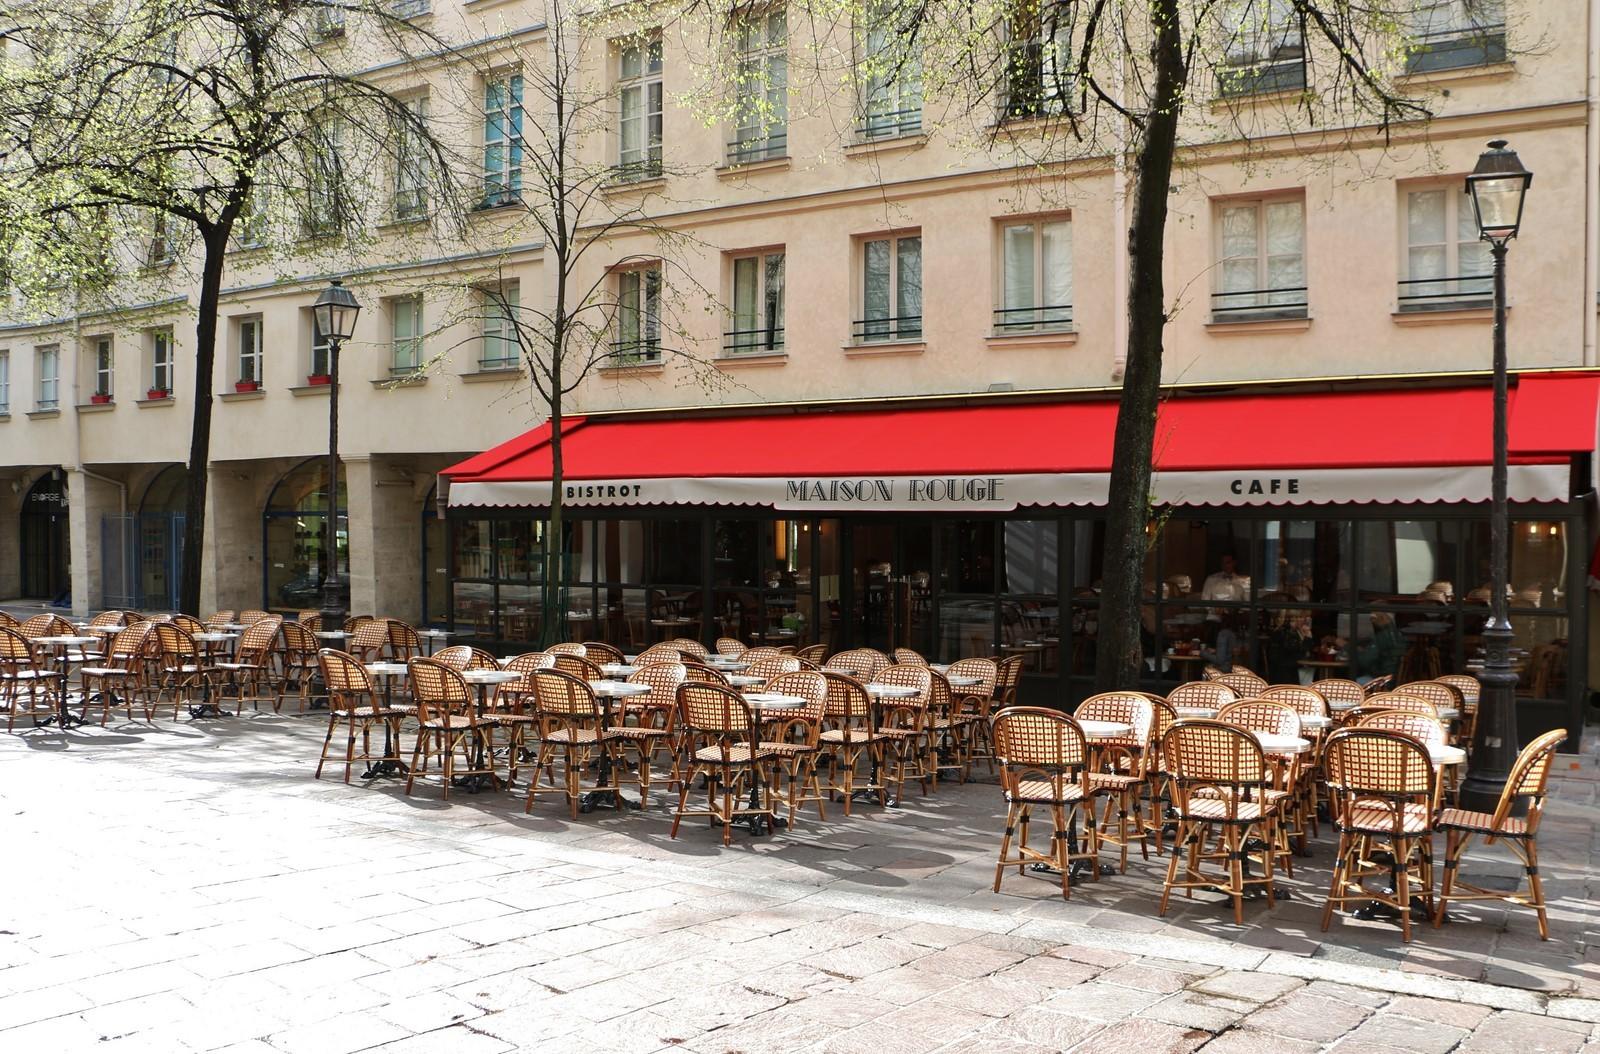 Brasserie Maison Rouge